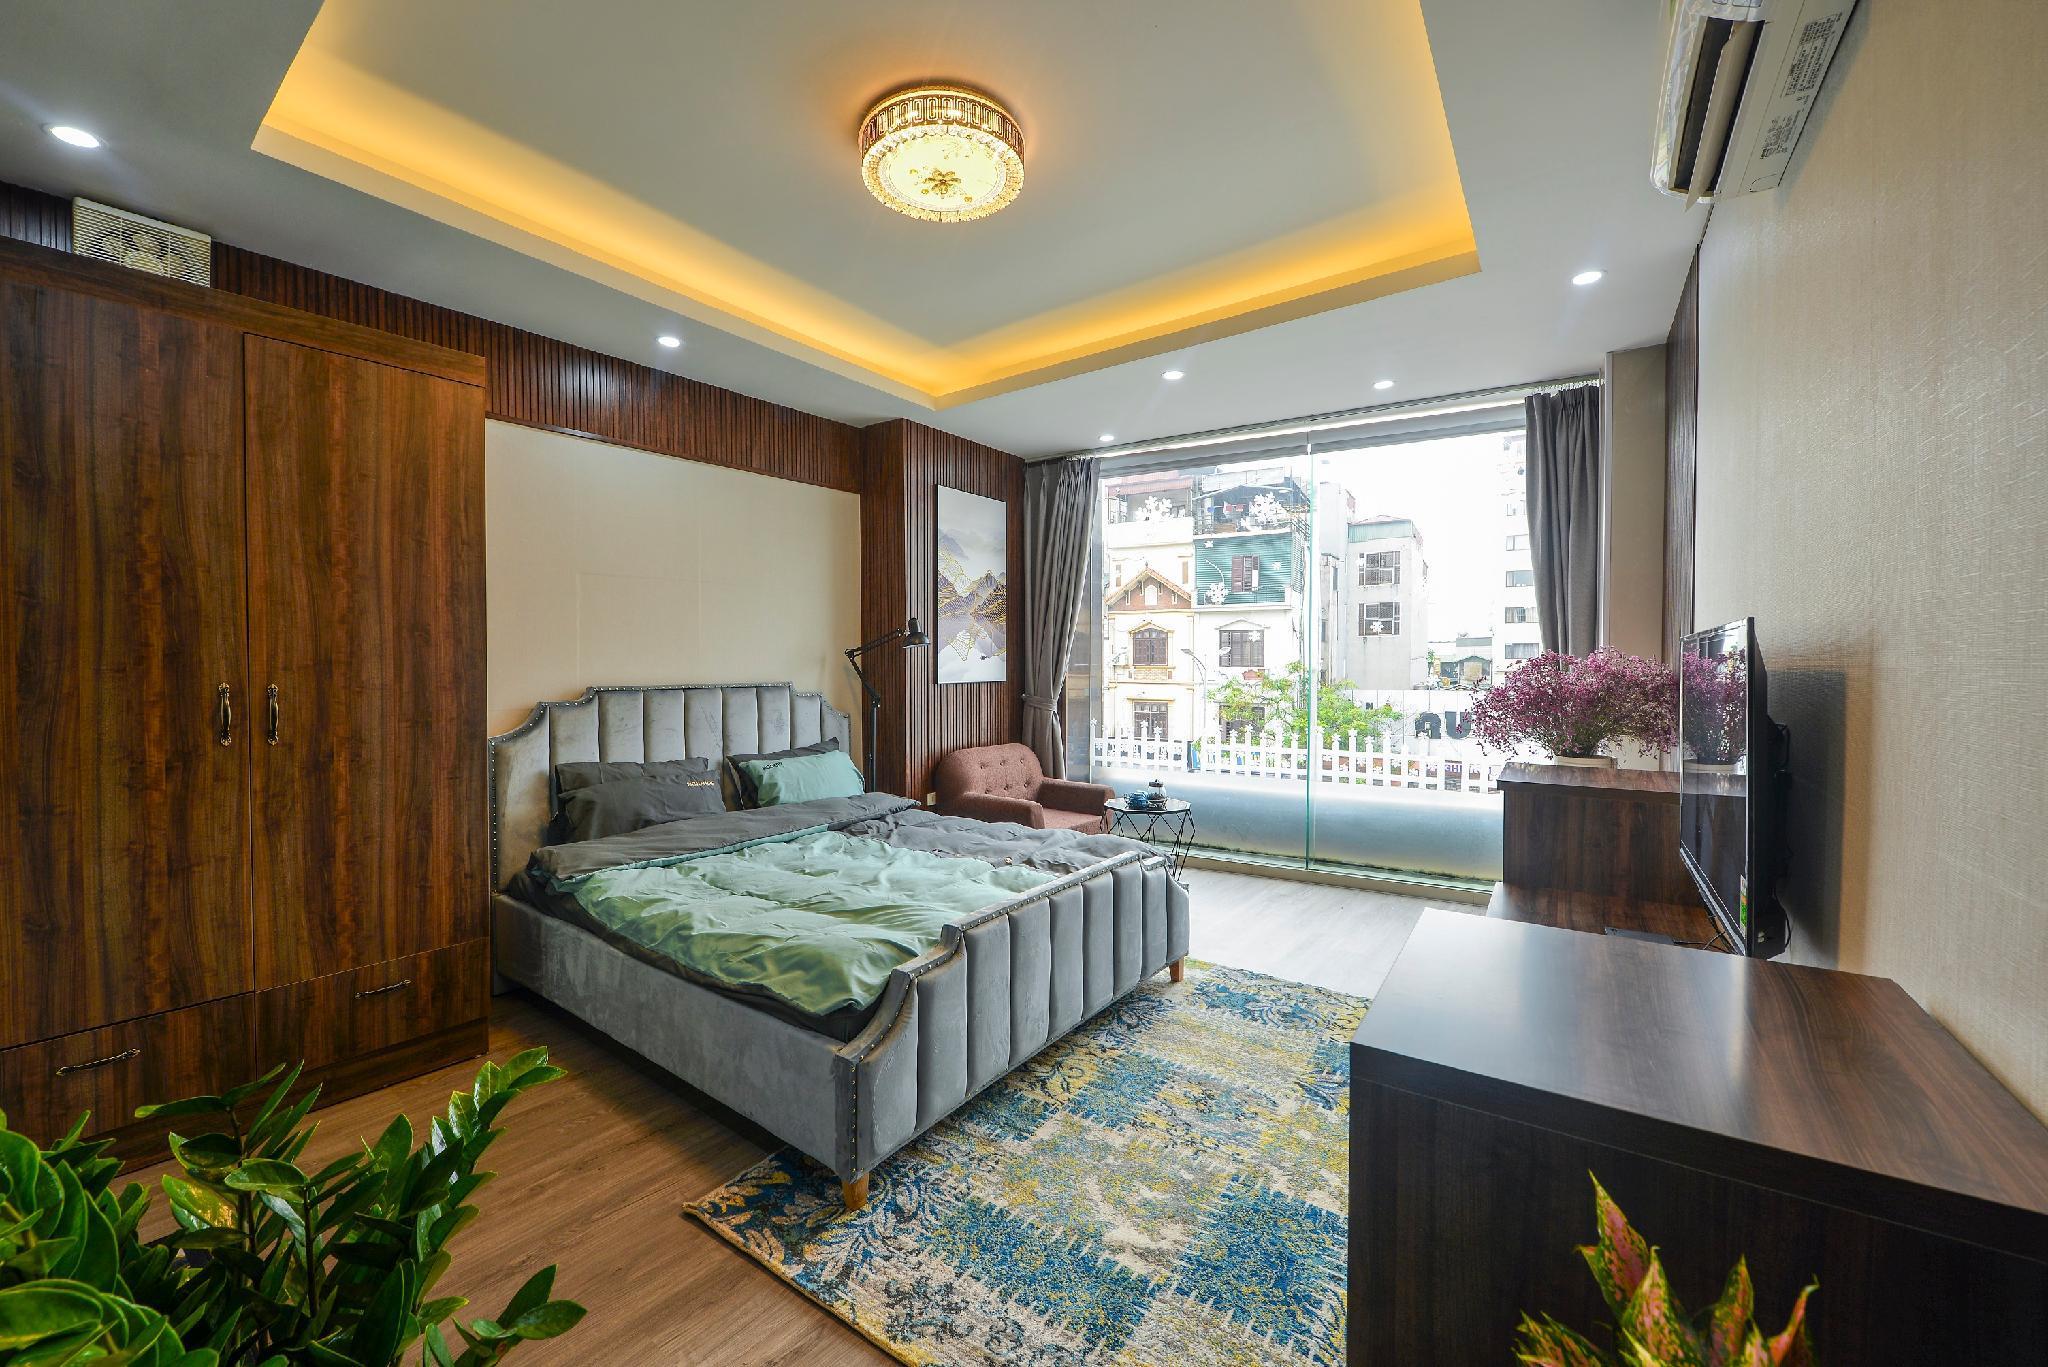 NUOVO New Room W. Massage Bathtub In Center Of HN